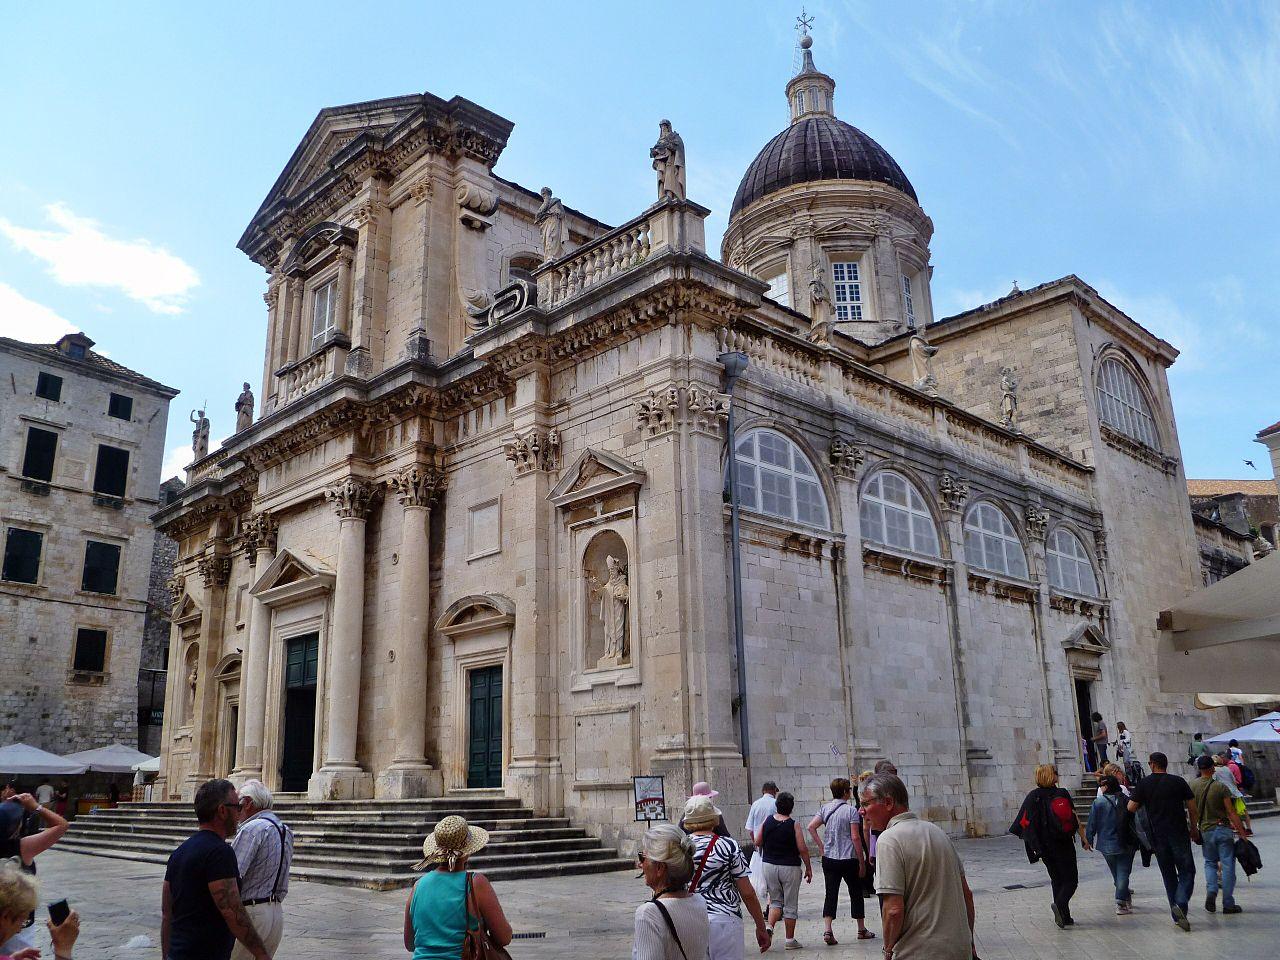 Vista de la catedral de Dubrovnik